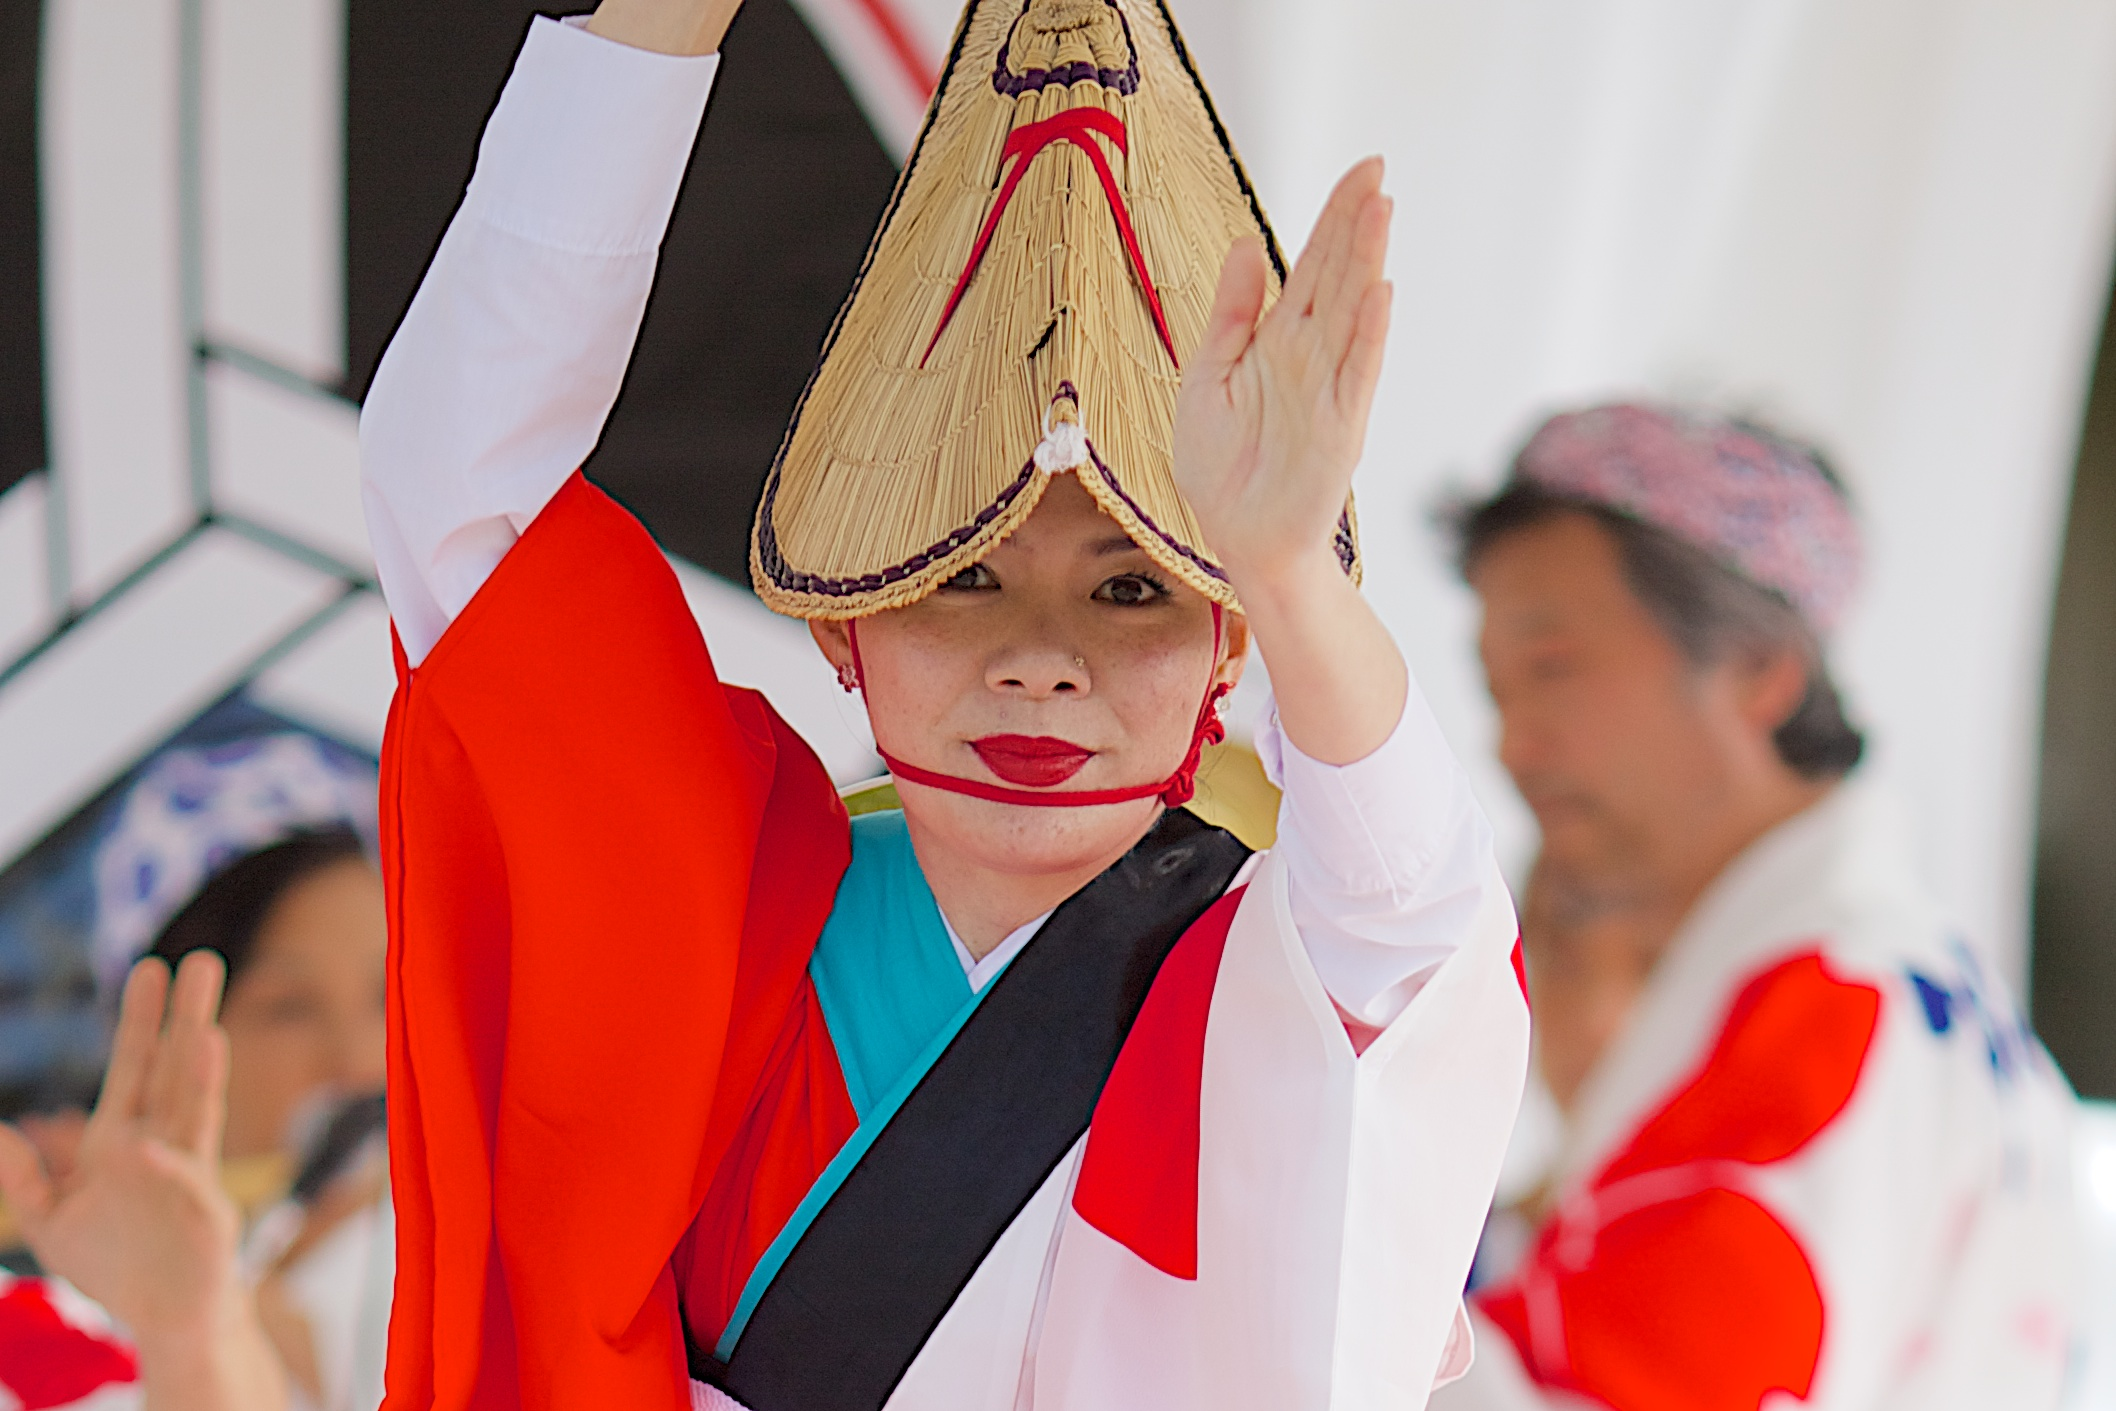 sakura-ren---japanese-cultural-fair-of-santa-cruz-2015_19408730038_o.jpg